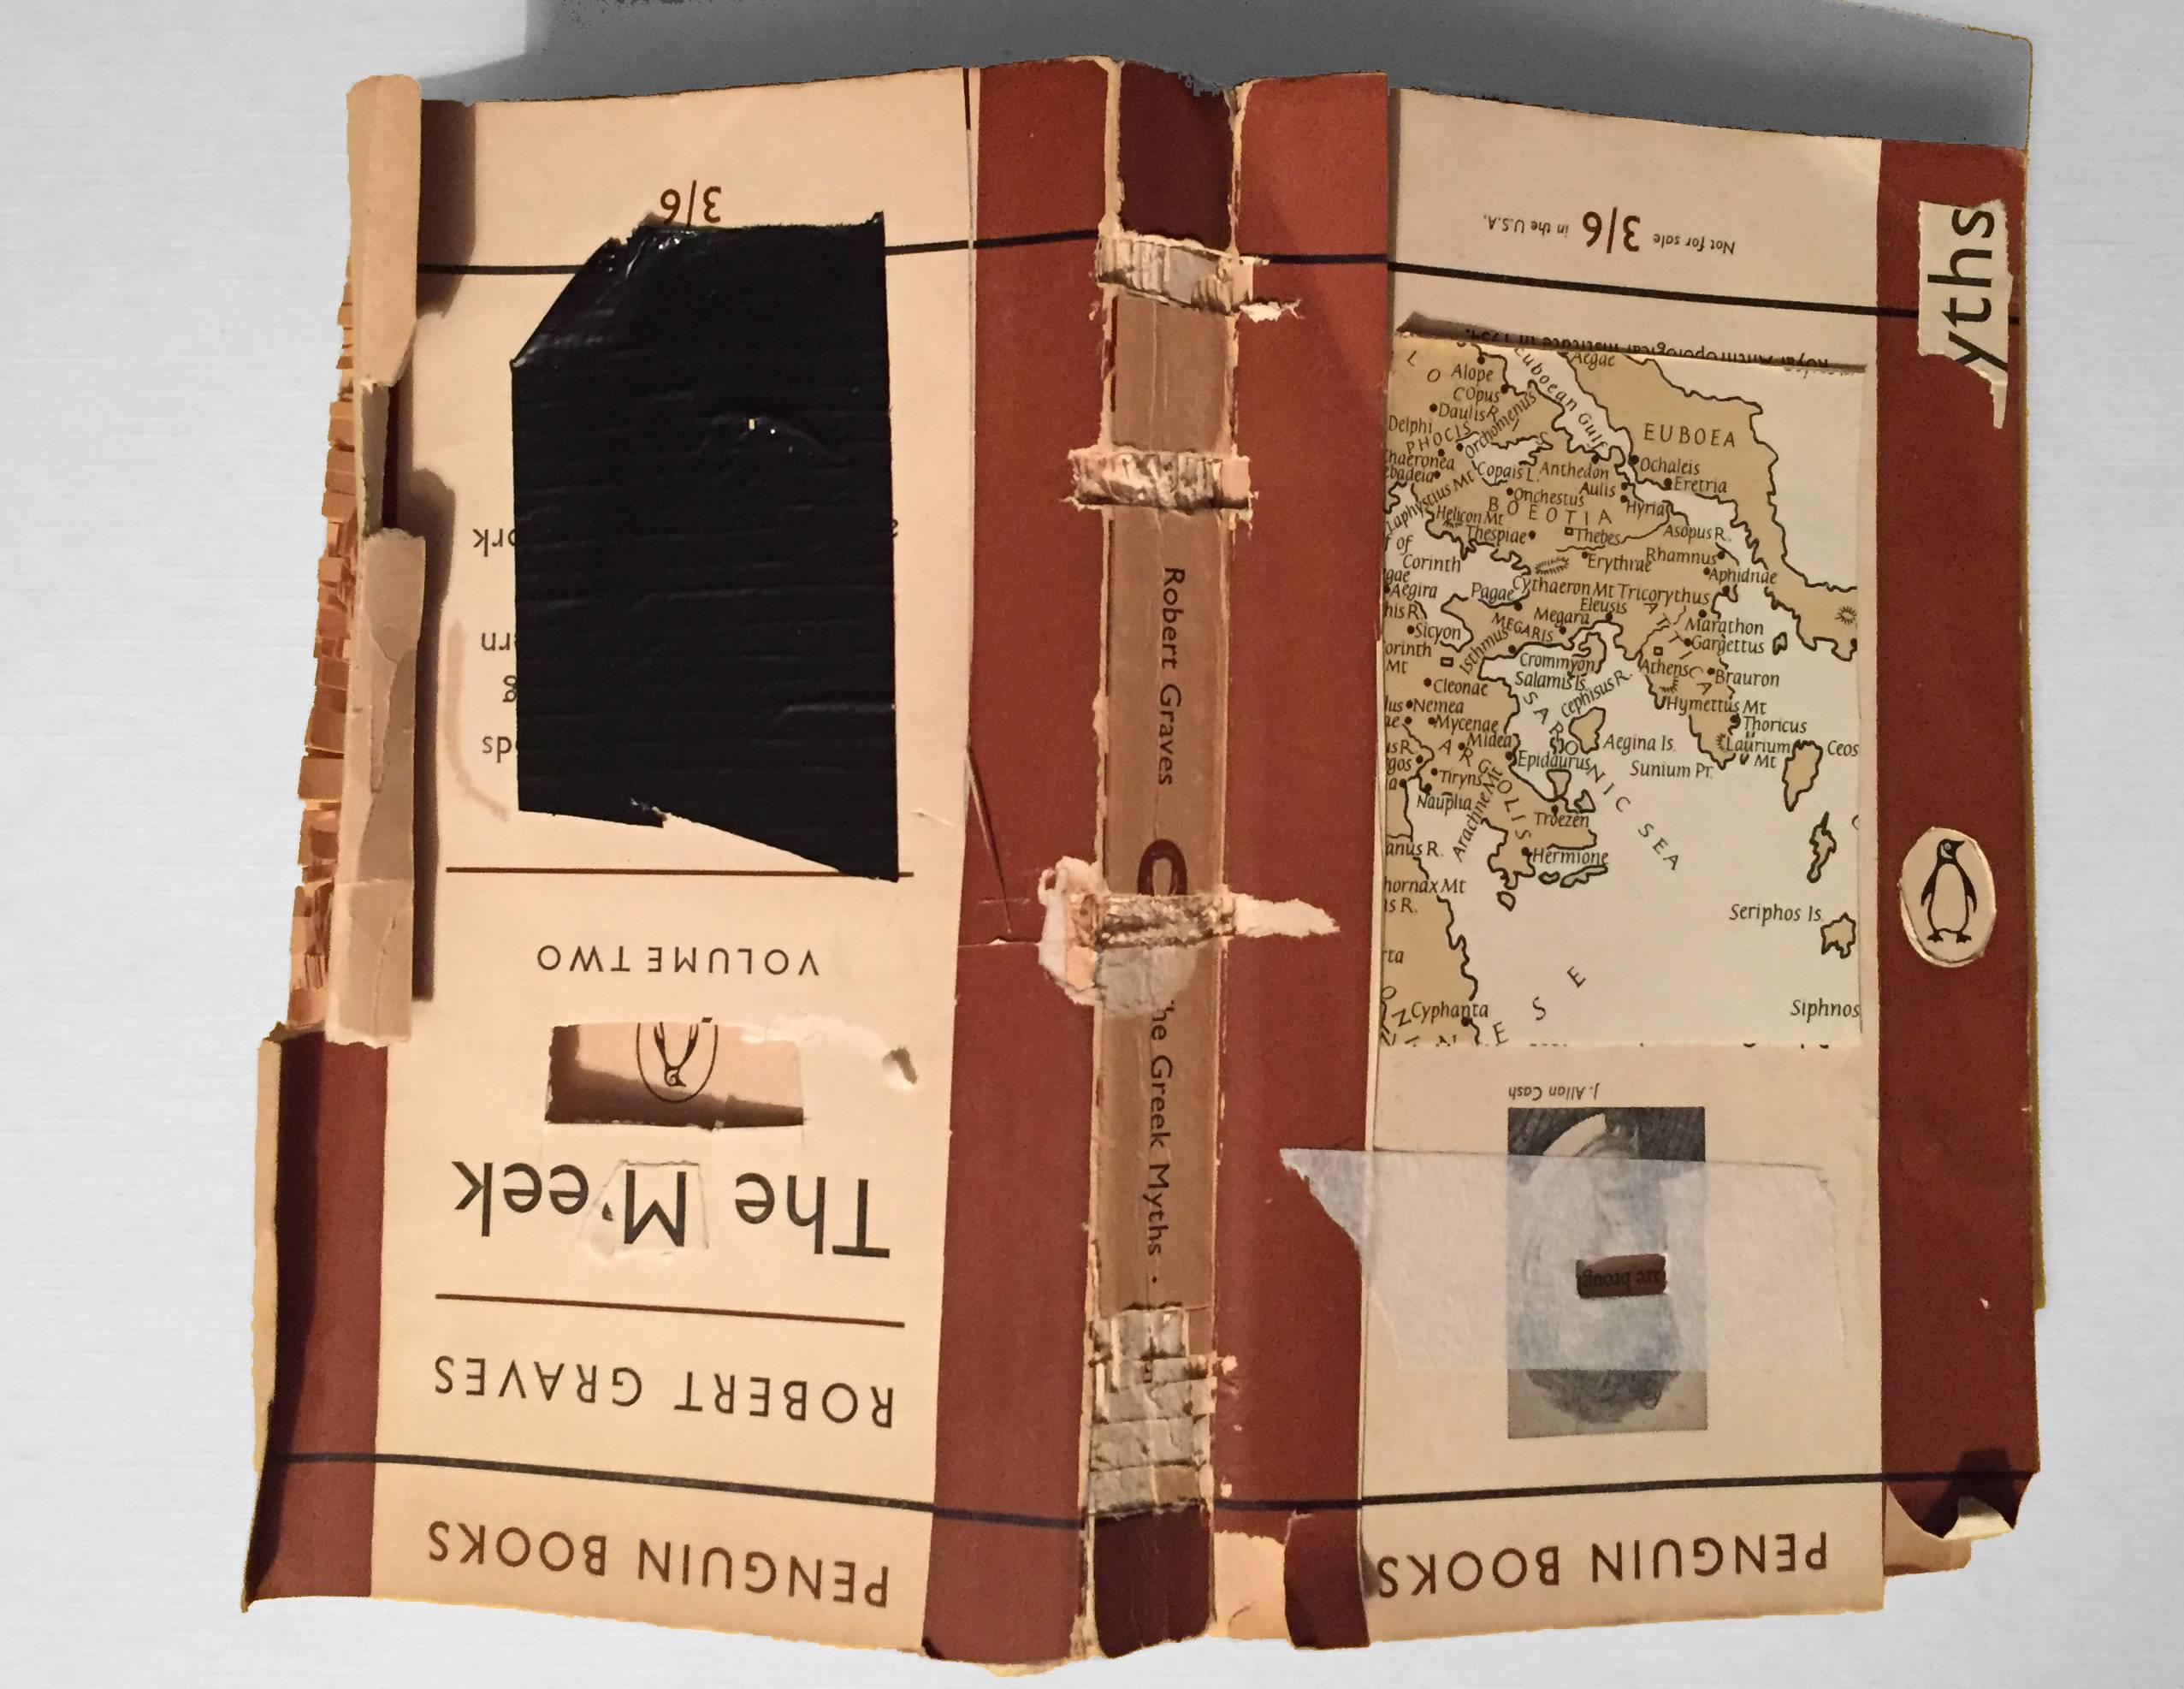 The Meek - book desecration